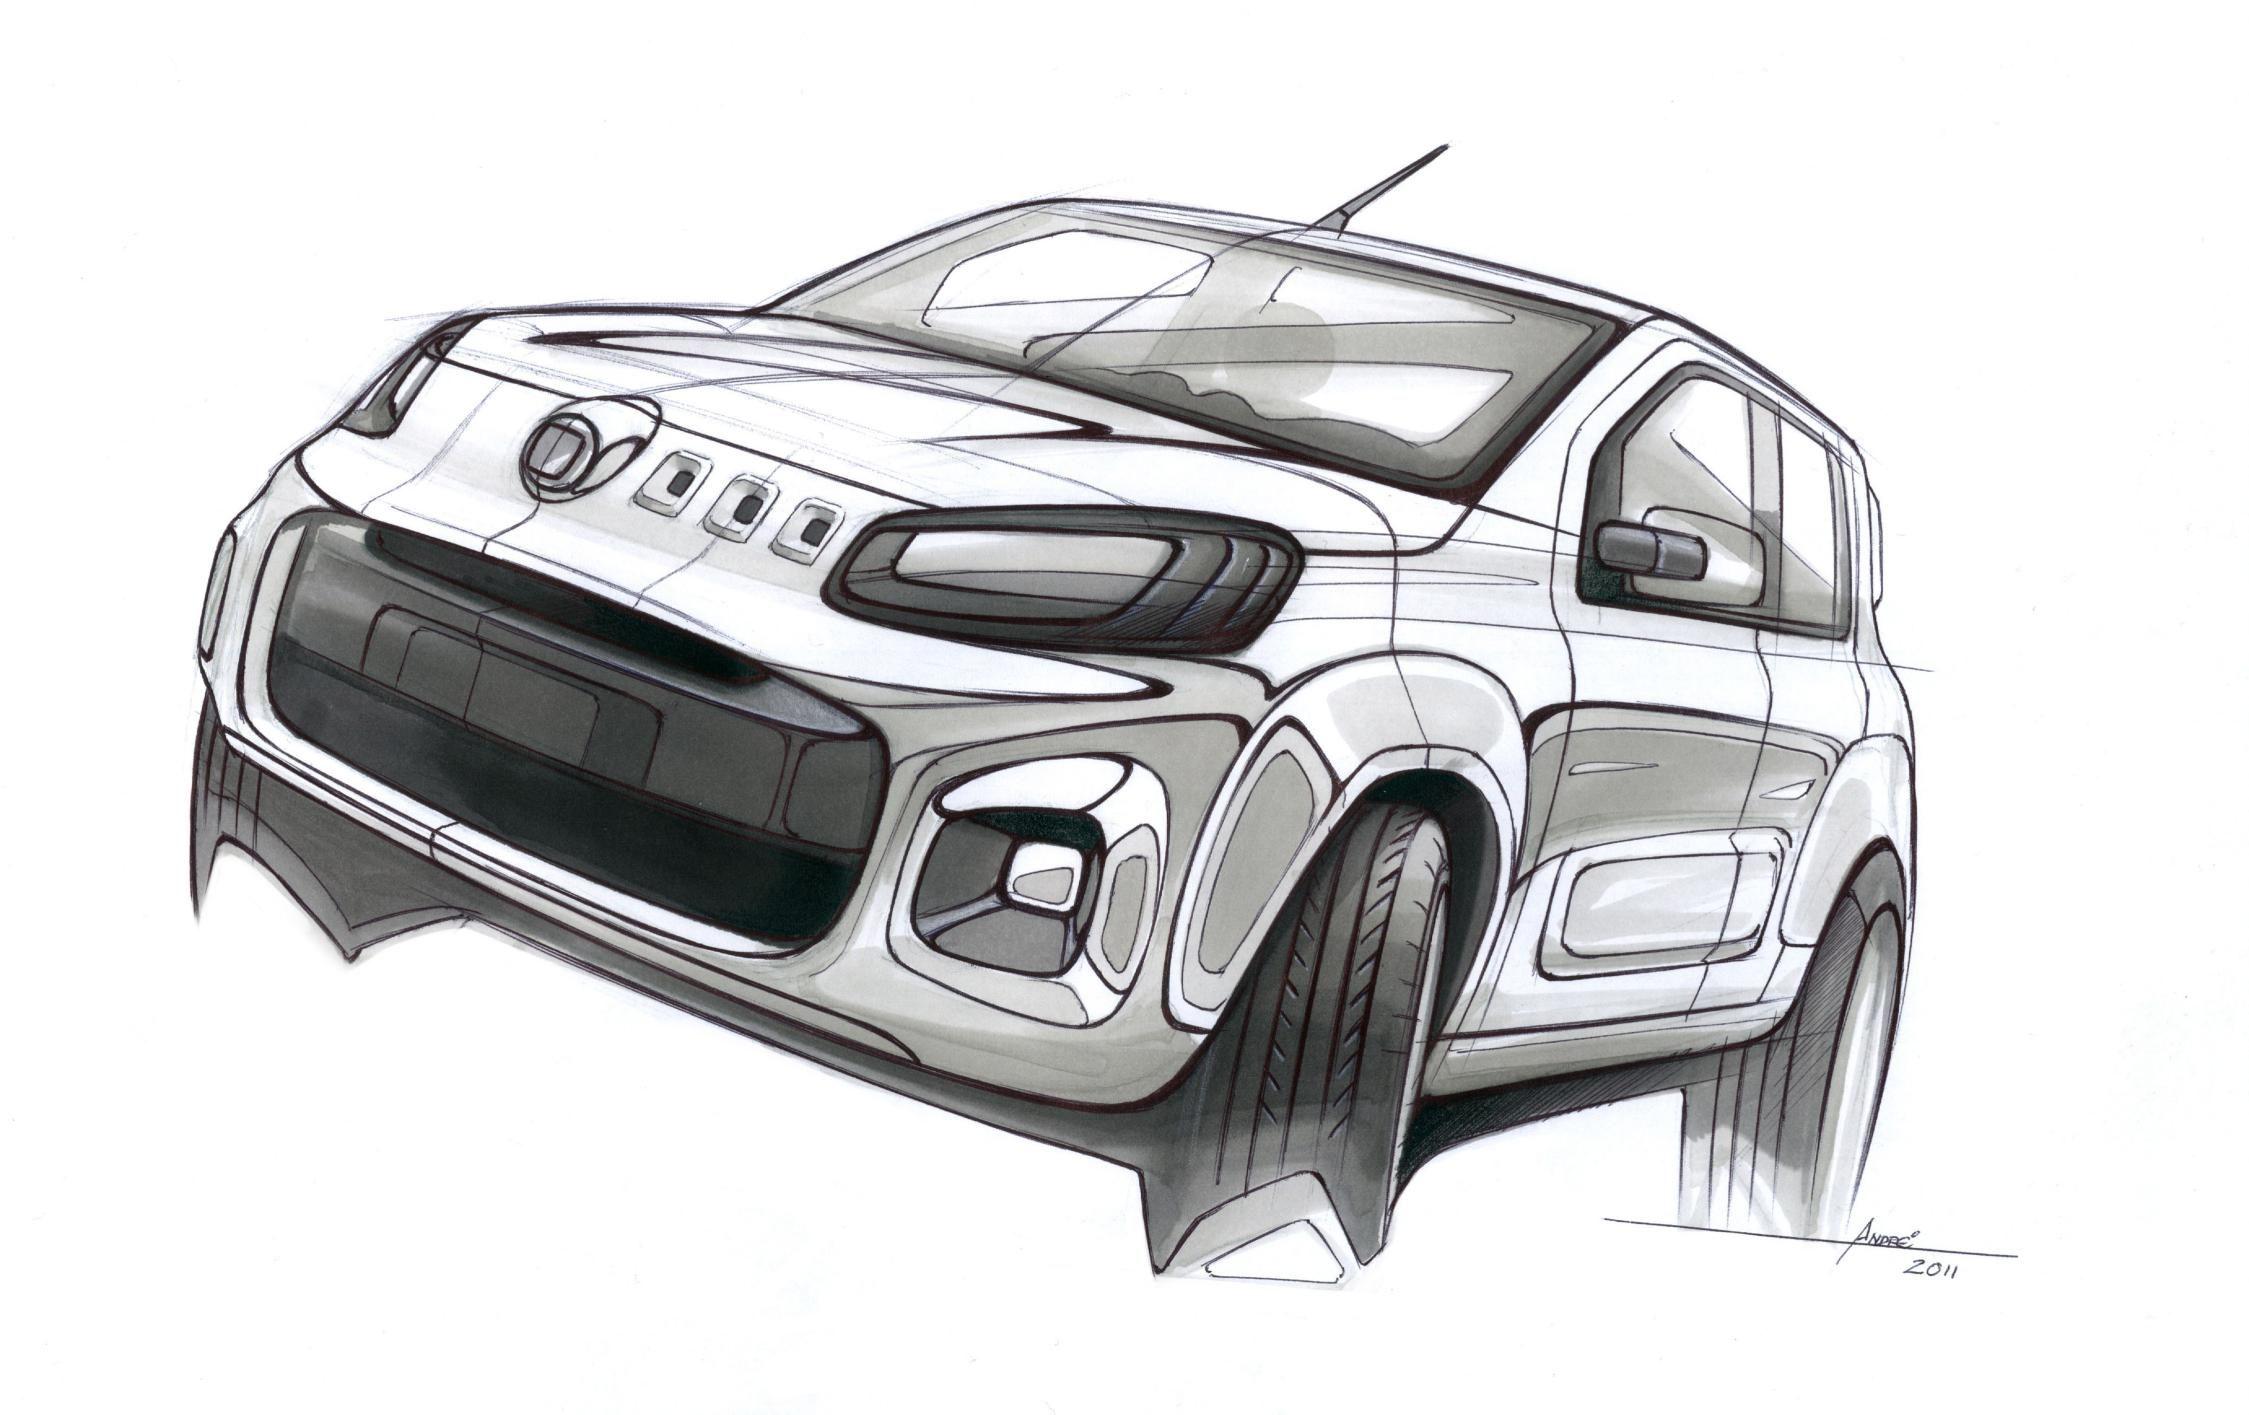 Pin by Keyur Bhesania on sketches   Pinterest   Sketches, Car sketch ...